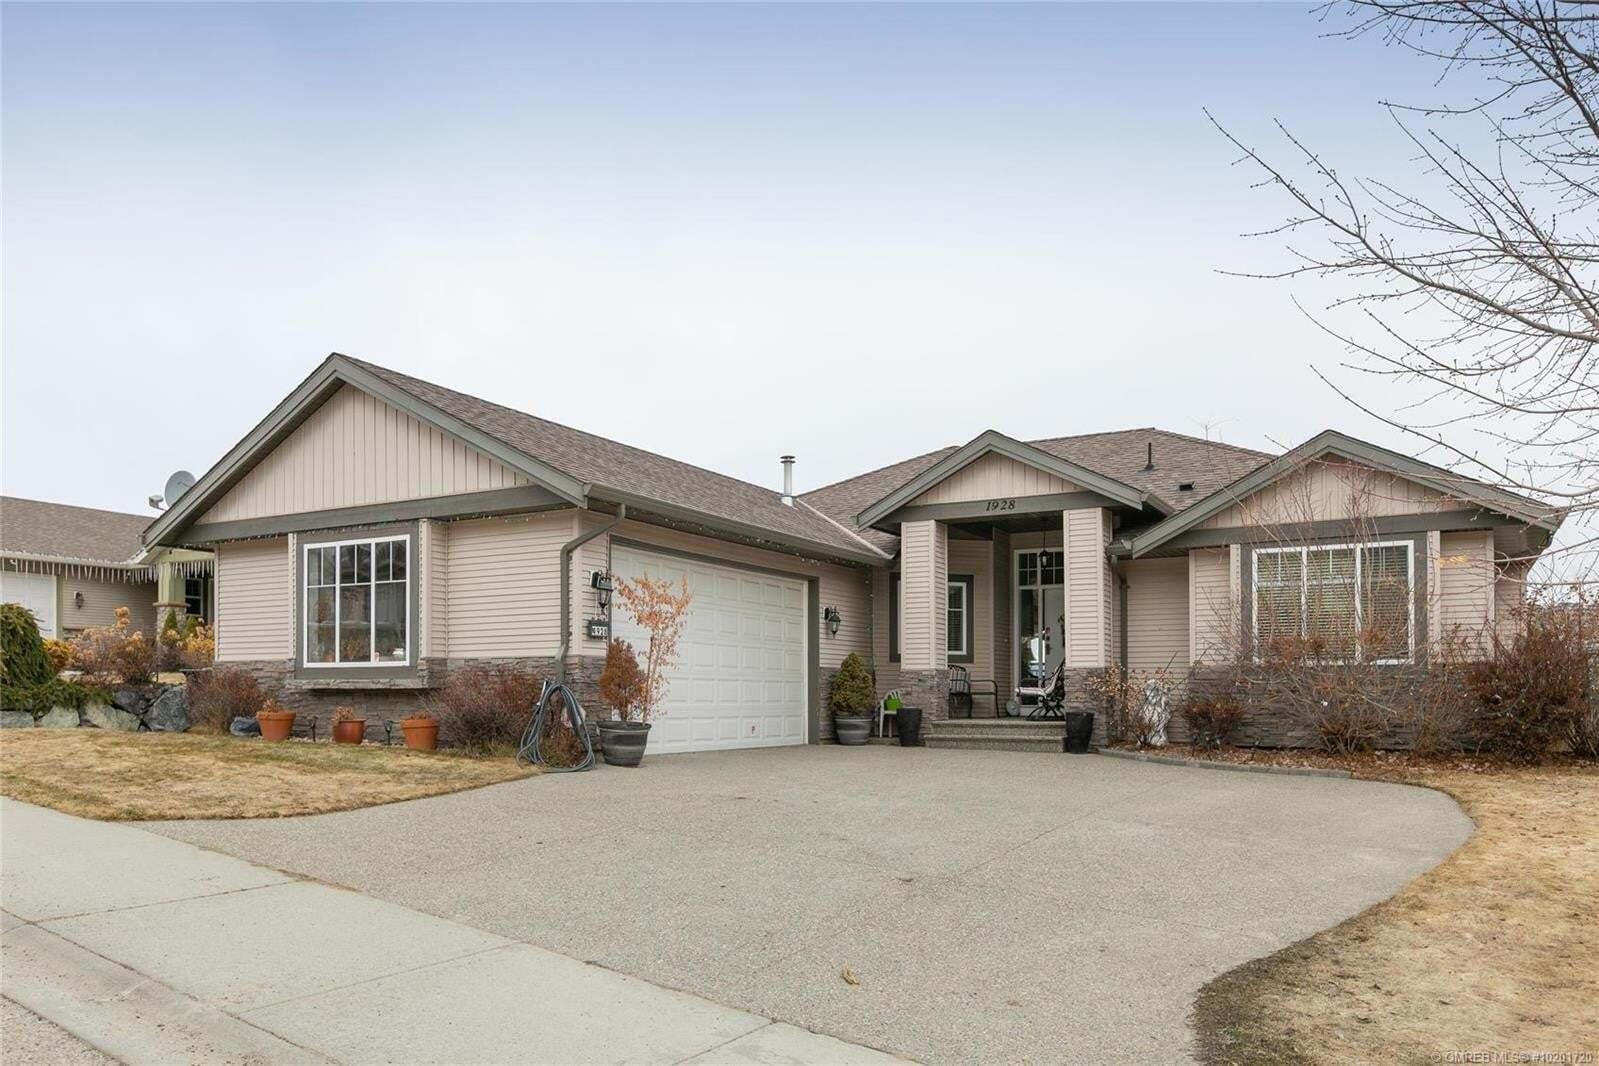 House for sale at 1928 Kloppenburg Ct Kelowna British Columbia - MLS: 10201720